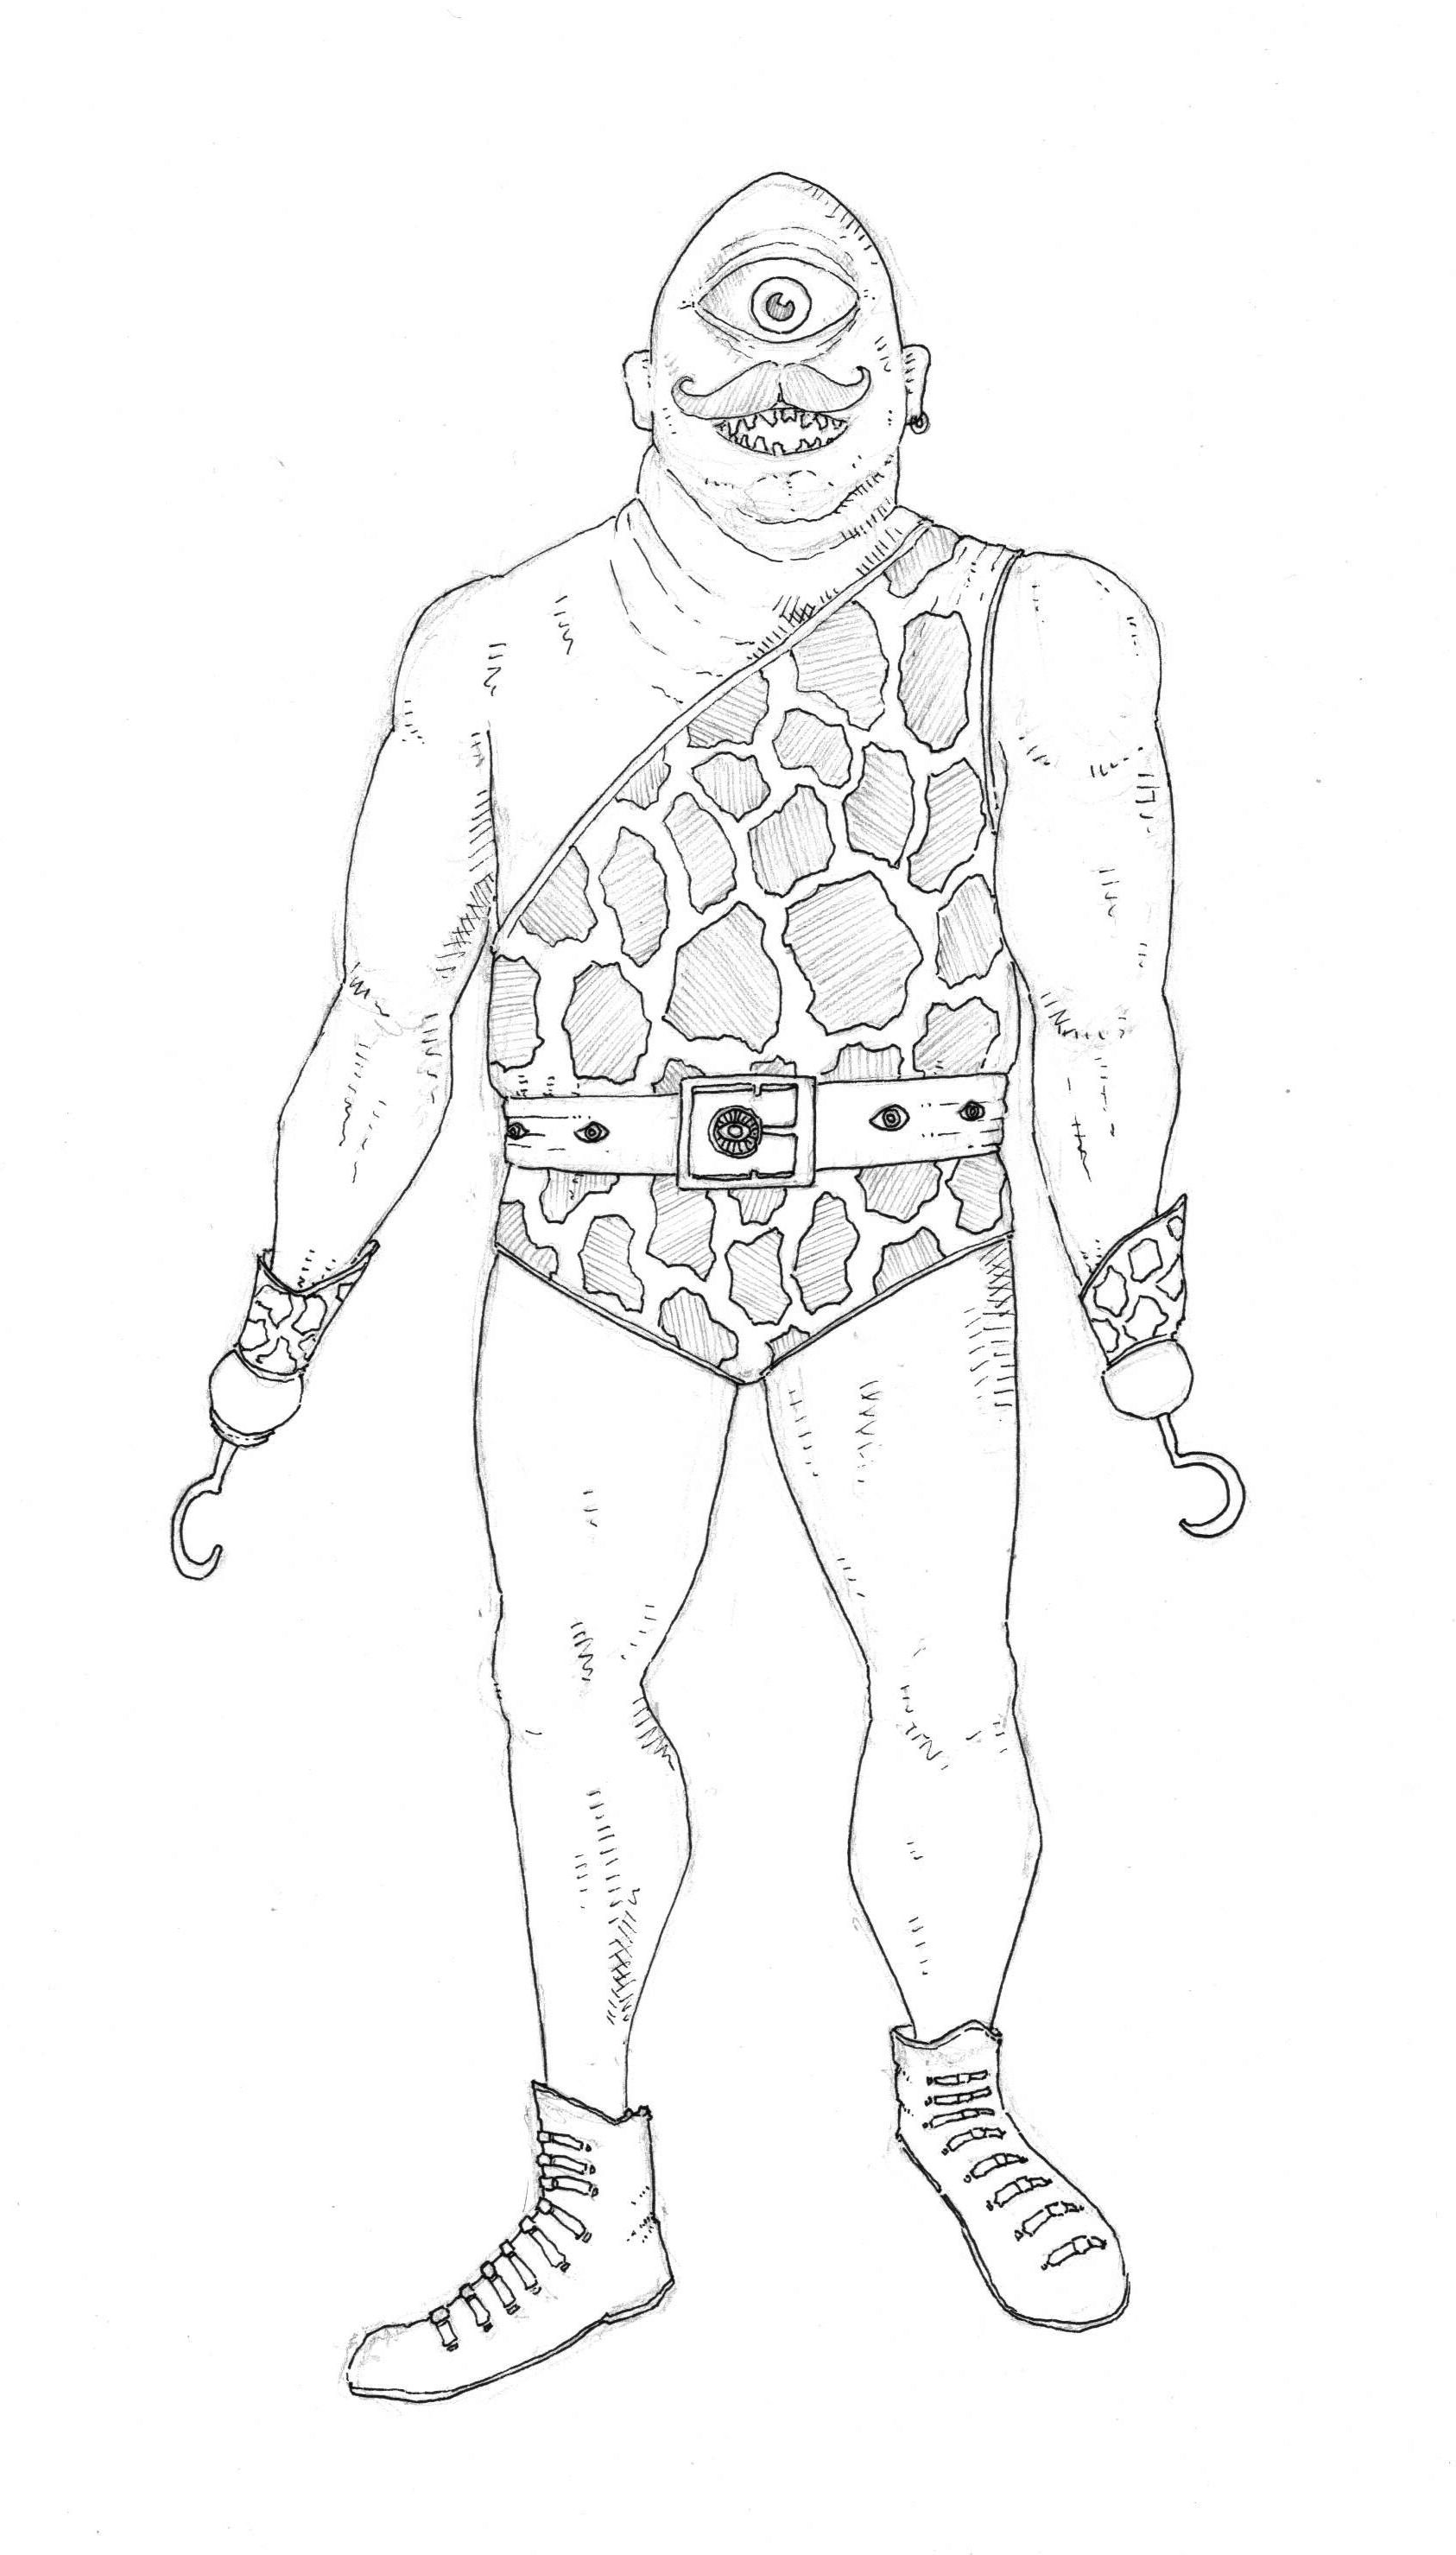 Yuck Character Design : Character design cyclops man welcome to spookville